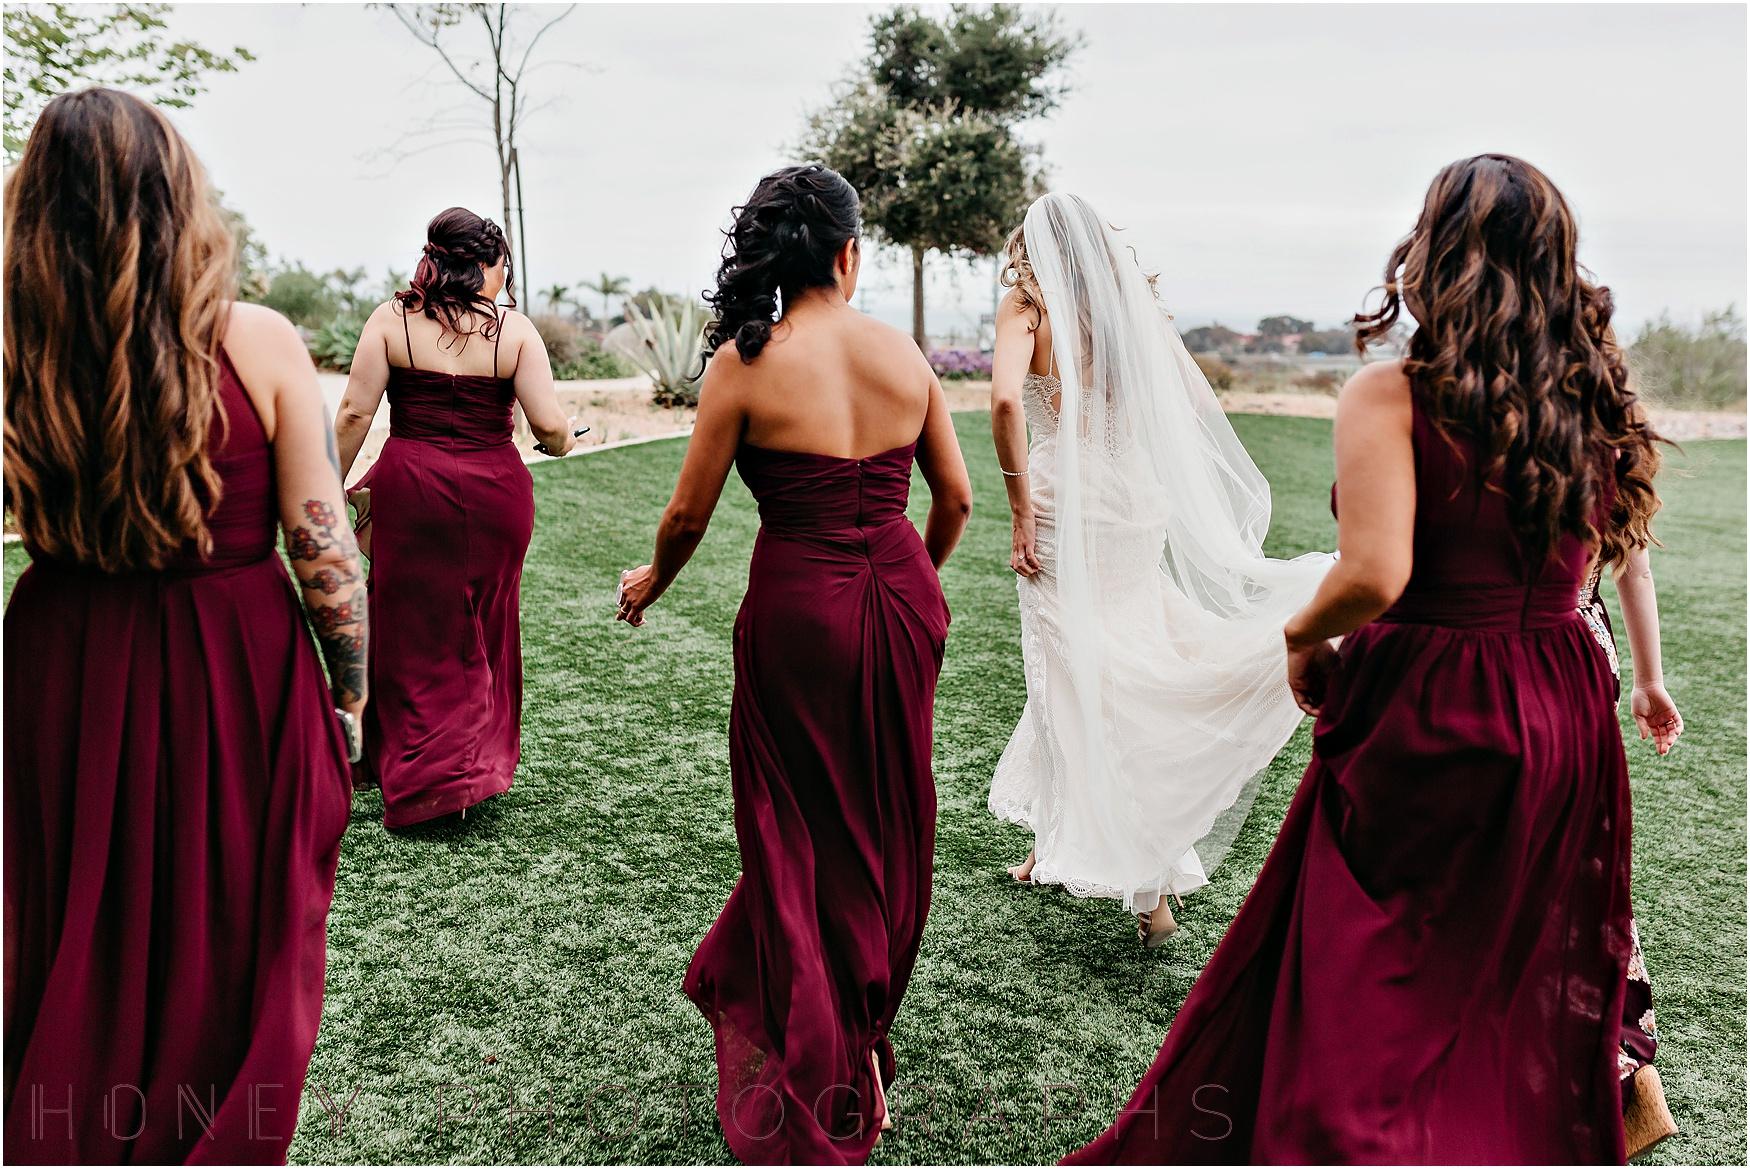 garden-classic-burgundy-jewel-tone-luxury-pacific-event-oceanside-wedding17.jpg